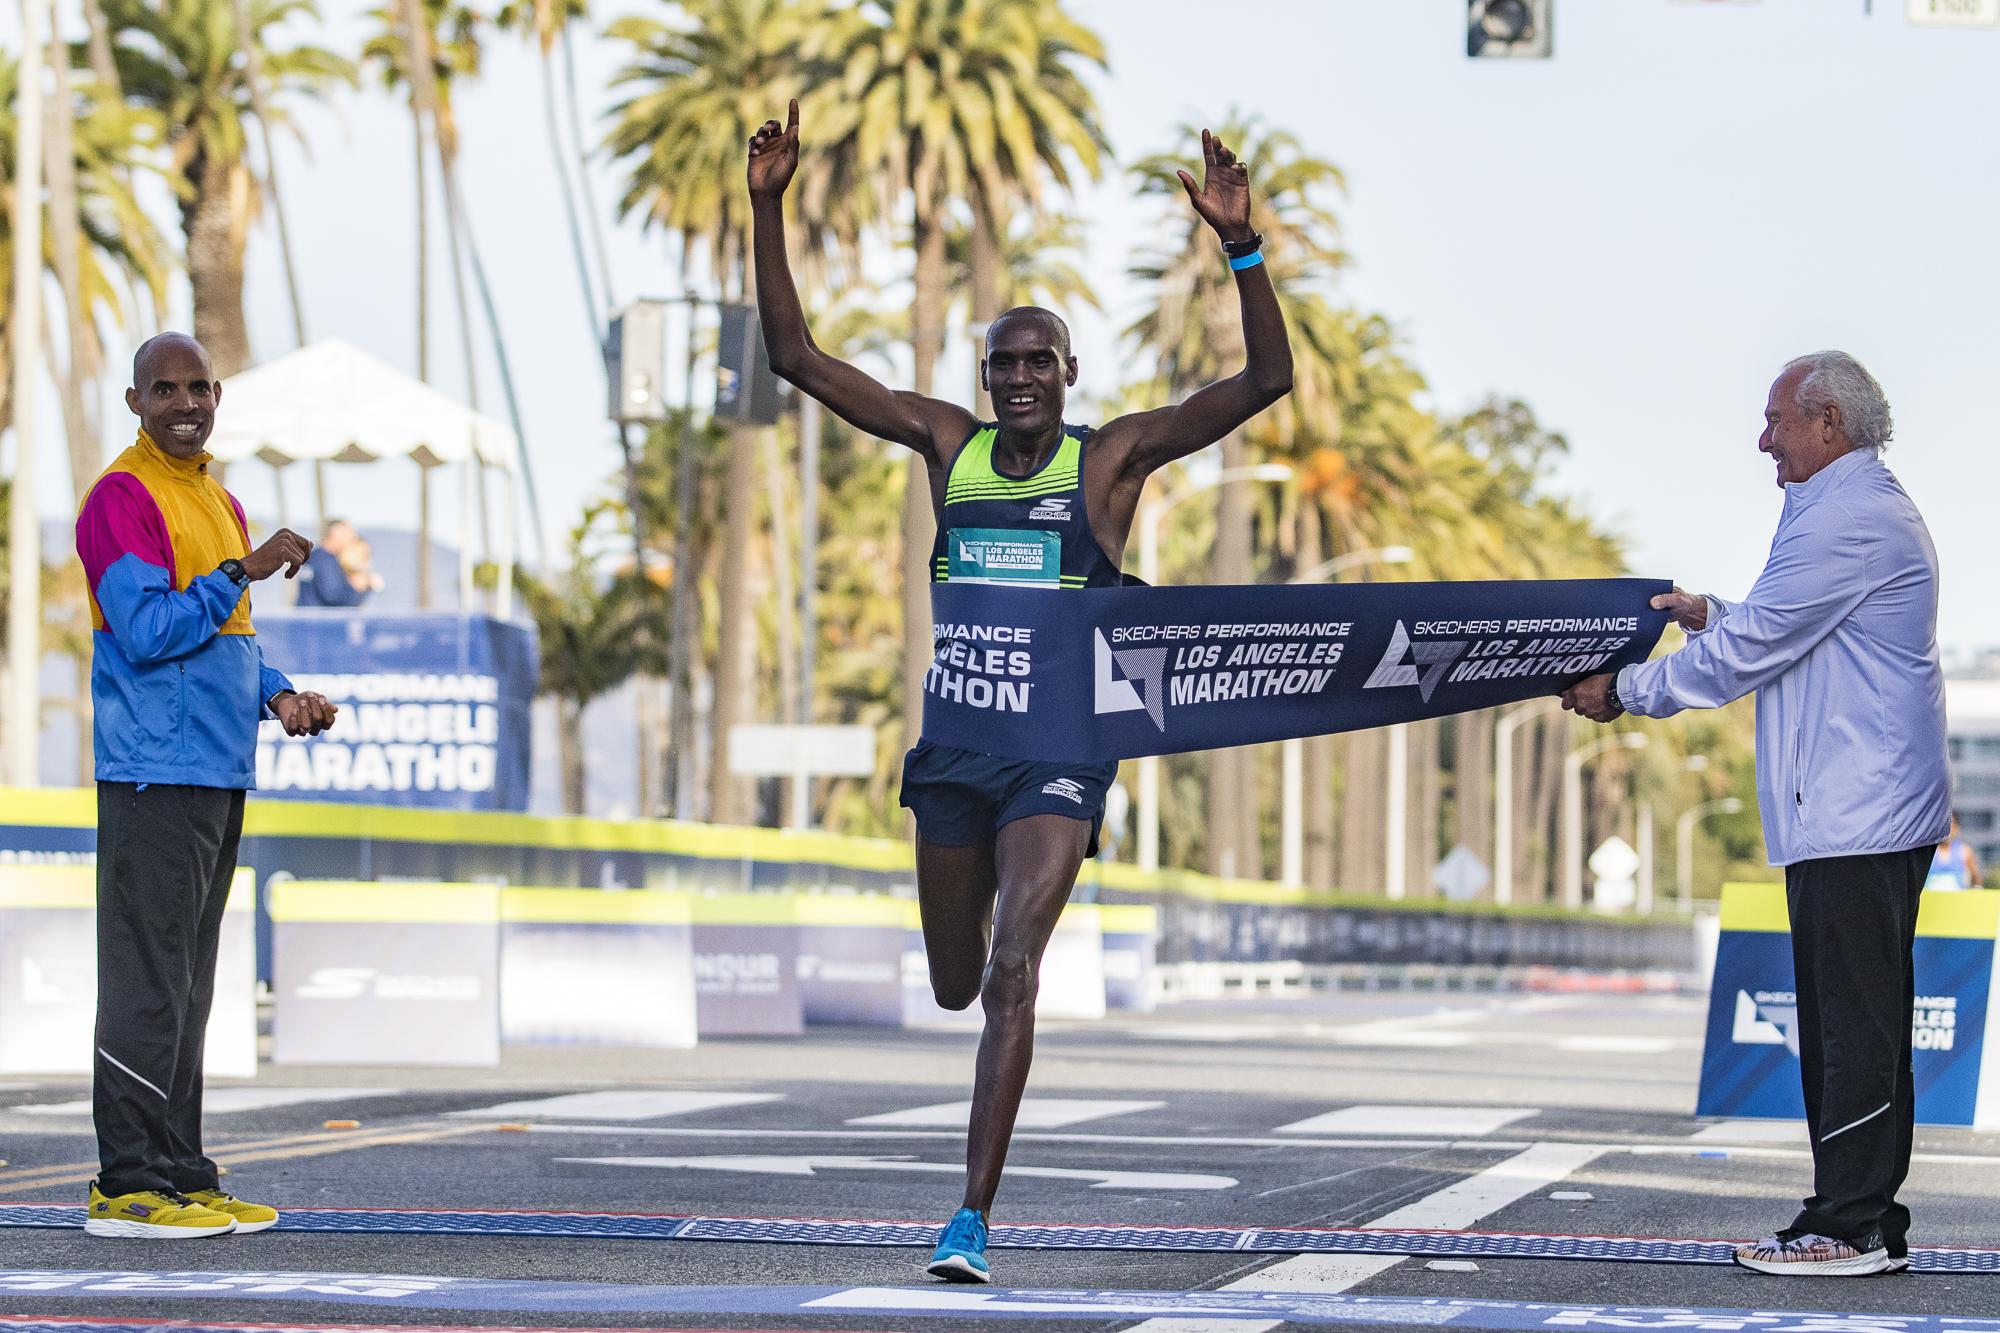 Weldon Kirui (middle) wins the Los Angeles Marathon on March 18, 2018 in Santa Monica, California with a time of 2:11:48. Kirui has won 2 out of the last 3 Los Angeles Marathons. (Zane Meyer-Thornton/Corsair Photo)